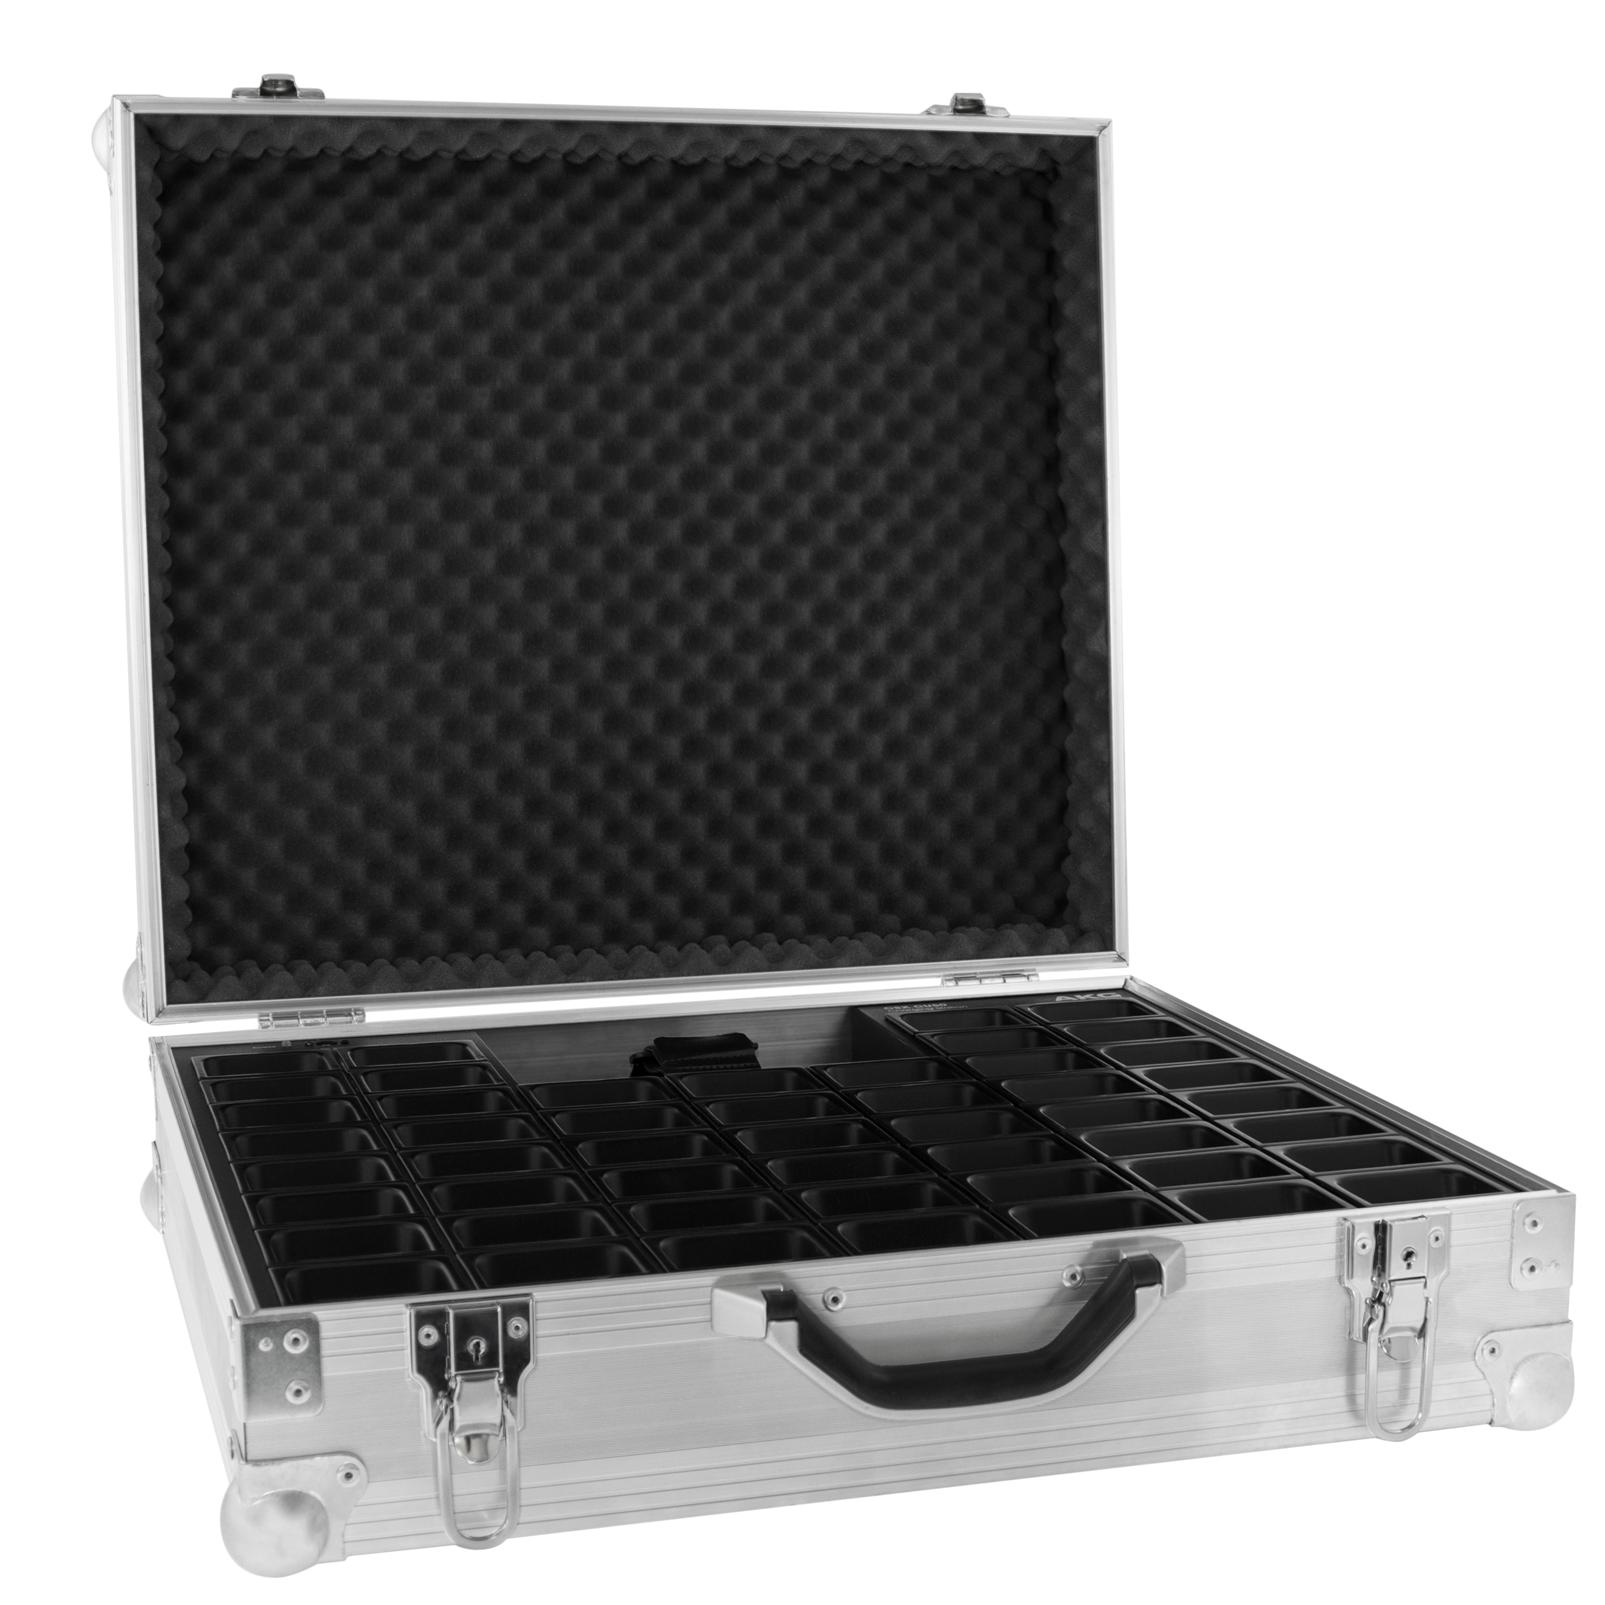 CSX CU50 - Grey - Storage and charging case - Hero